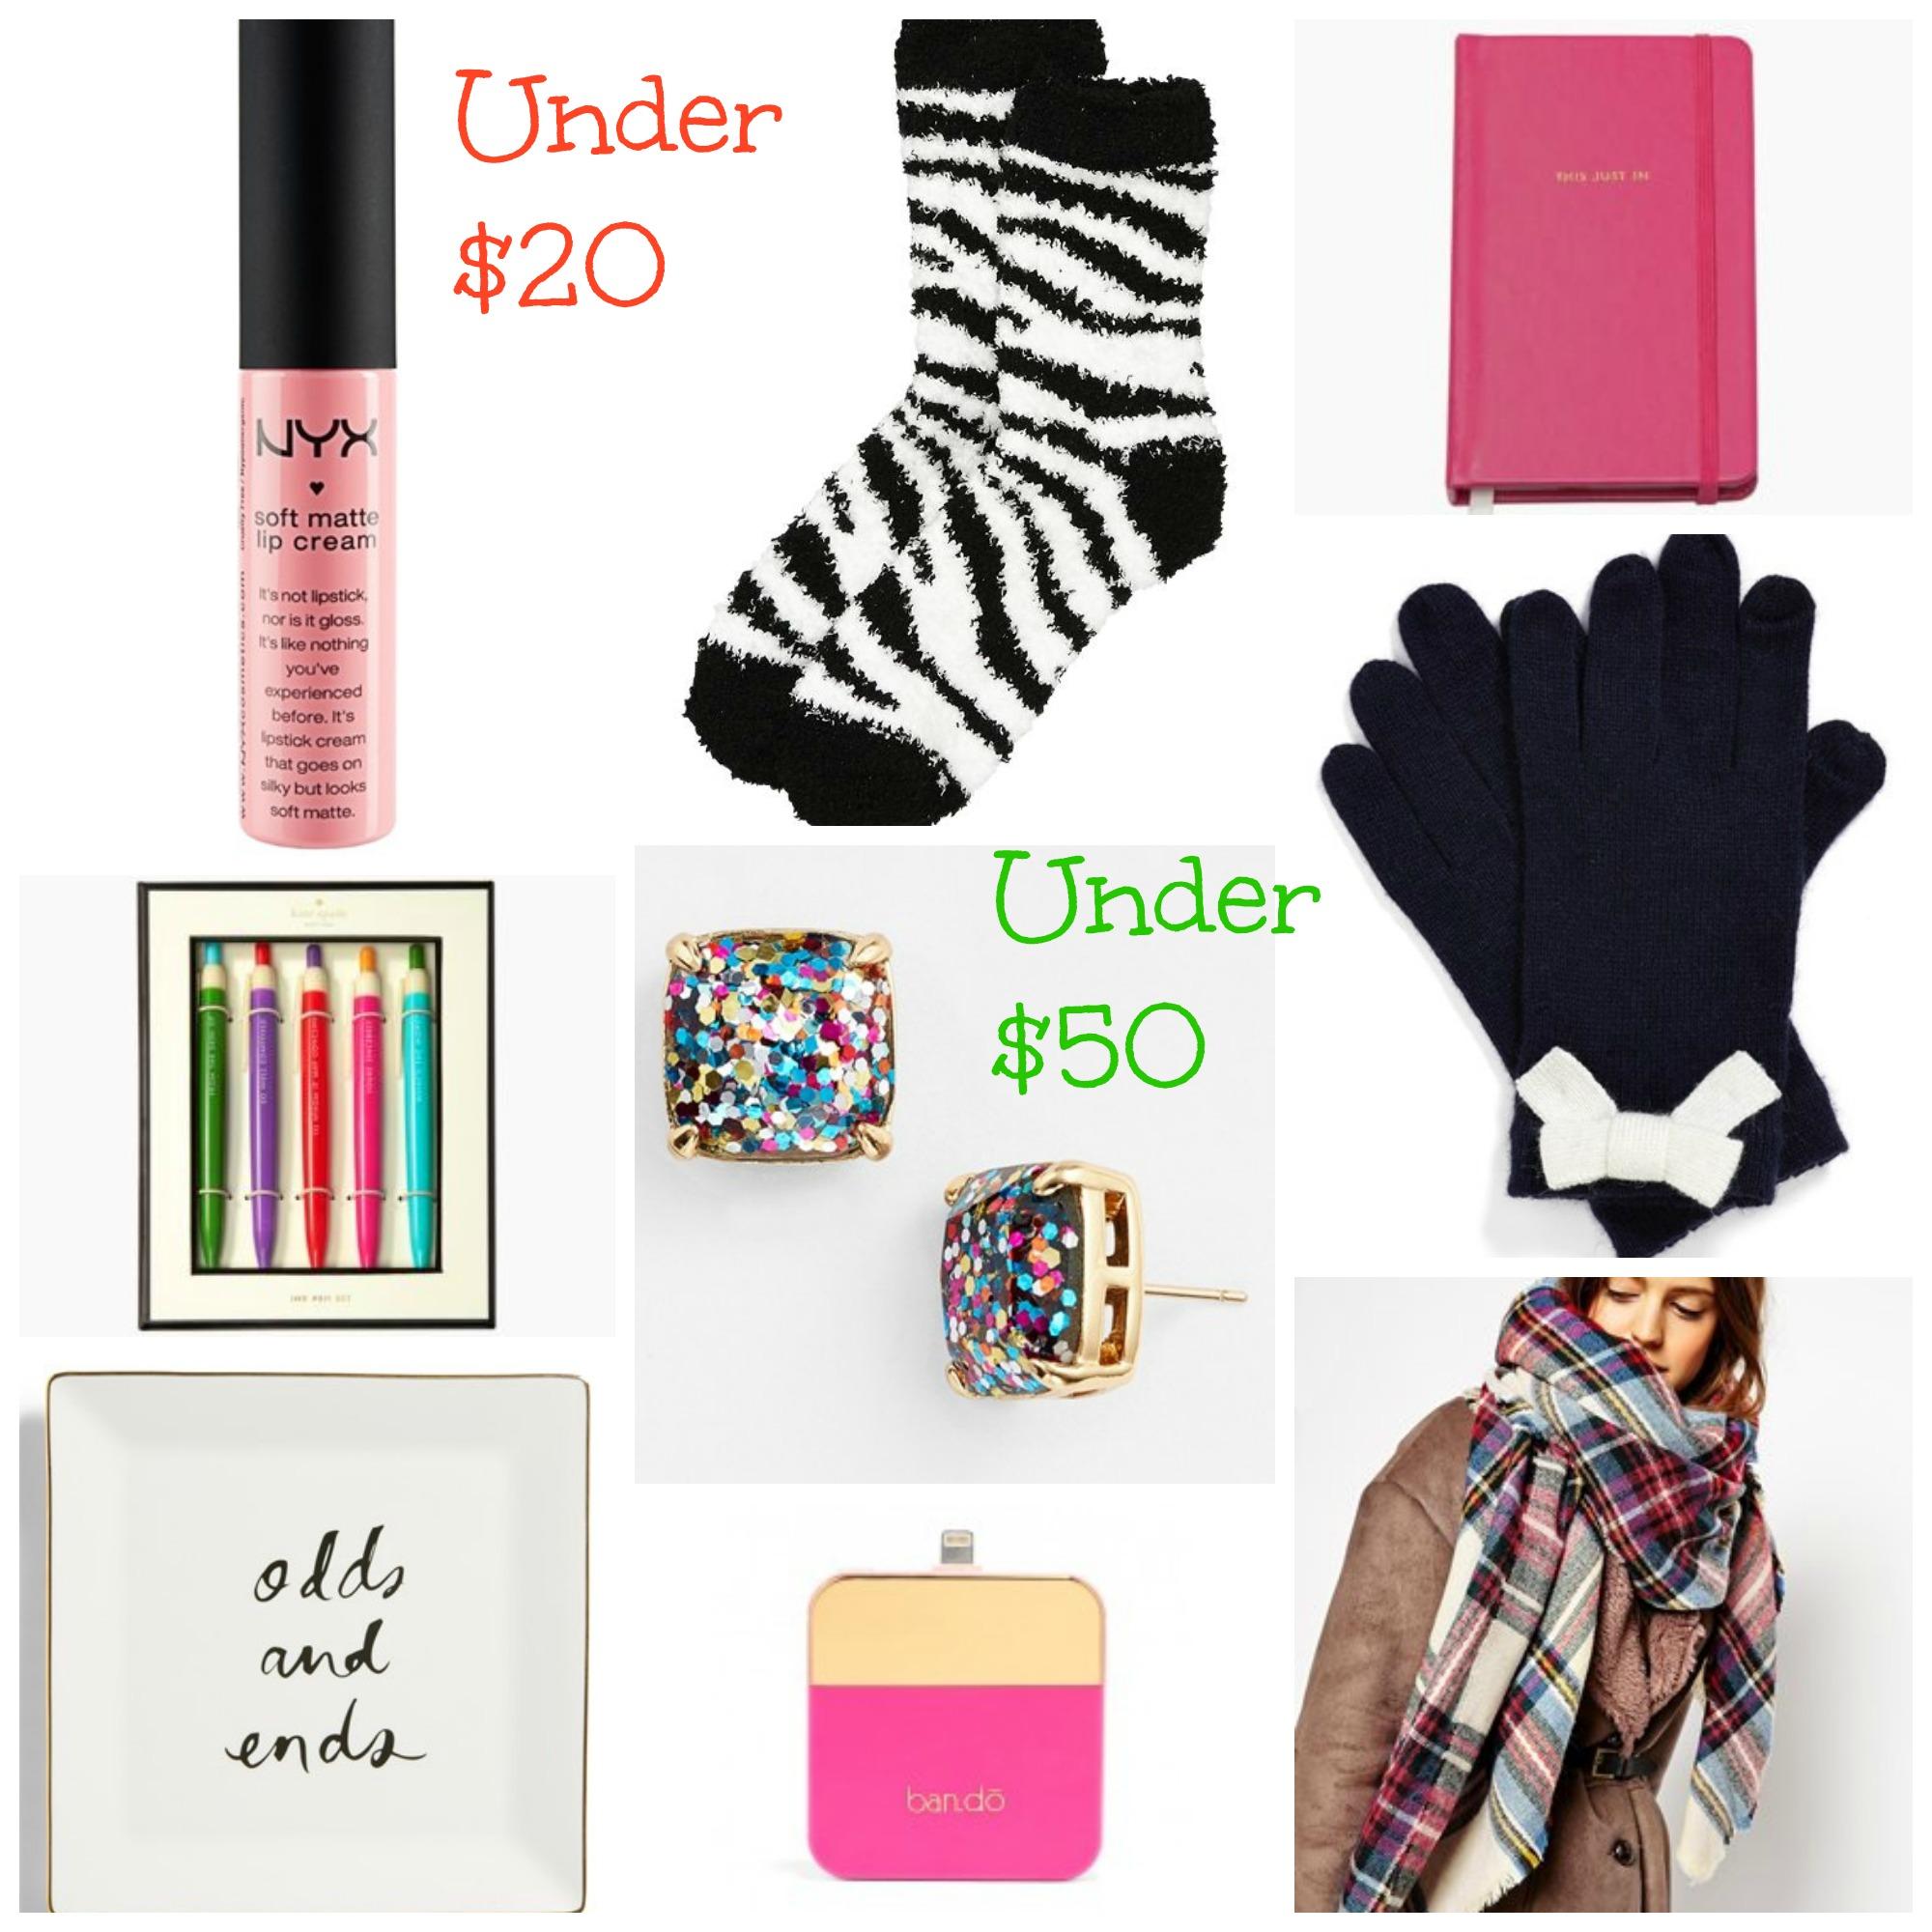 Dec 2014 Gift Guide 1